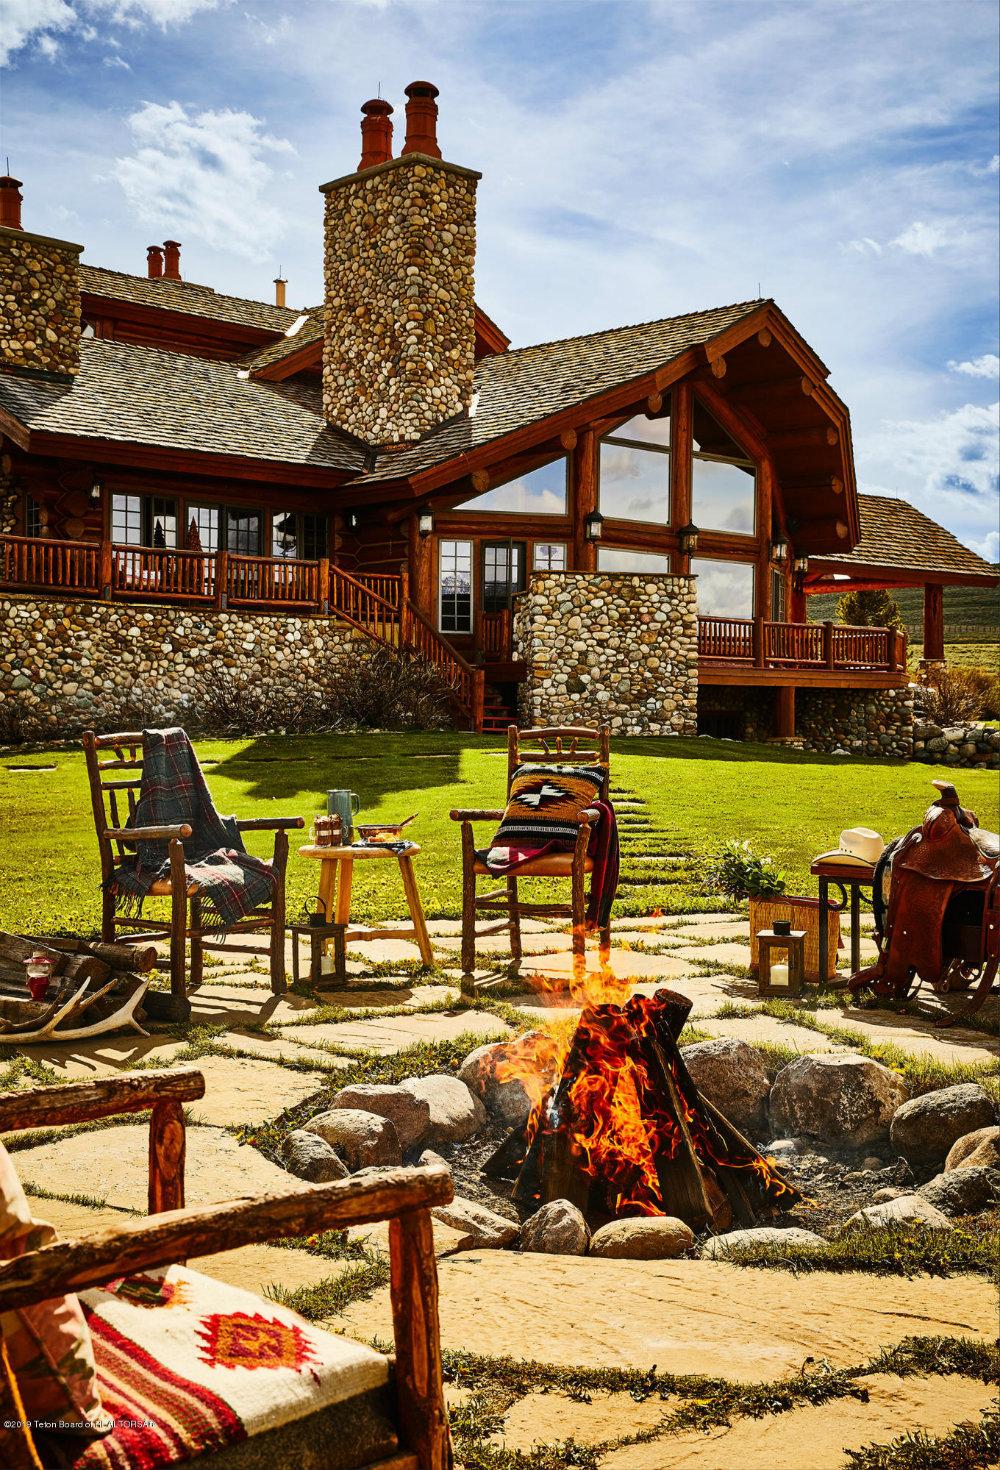 Image of: Outdoor Fireplace Design Ideas